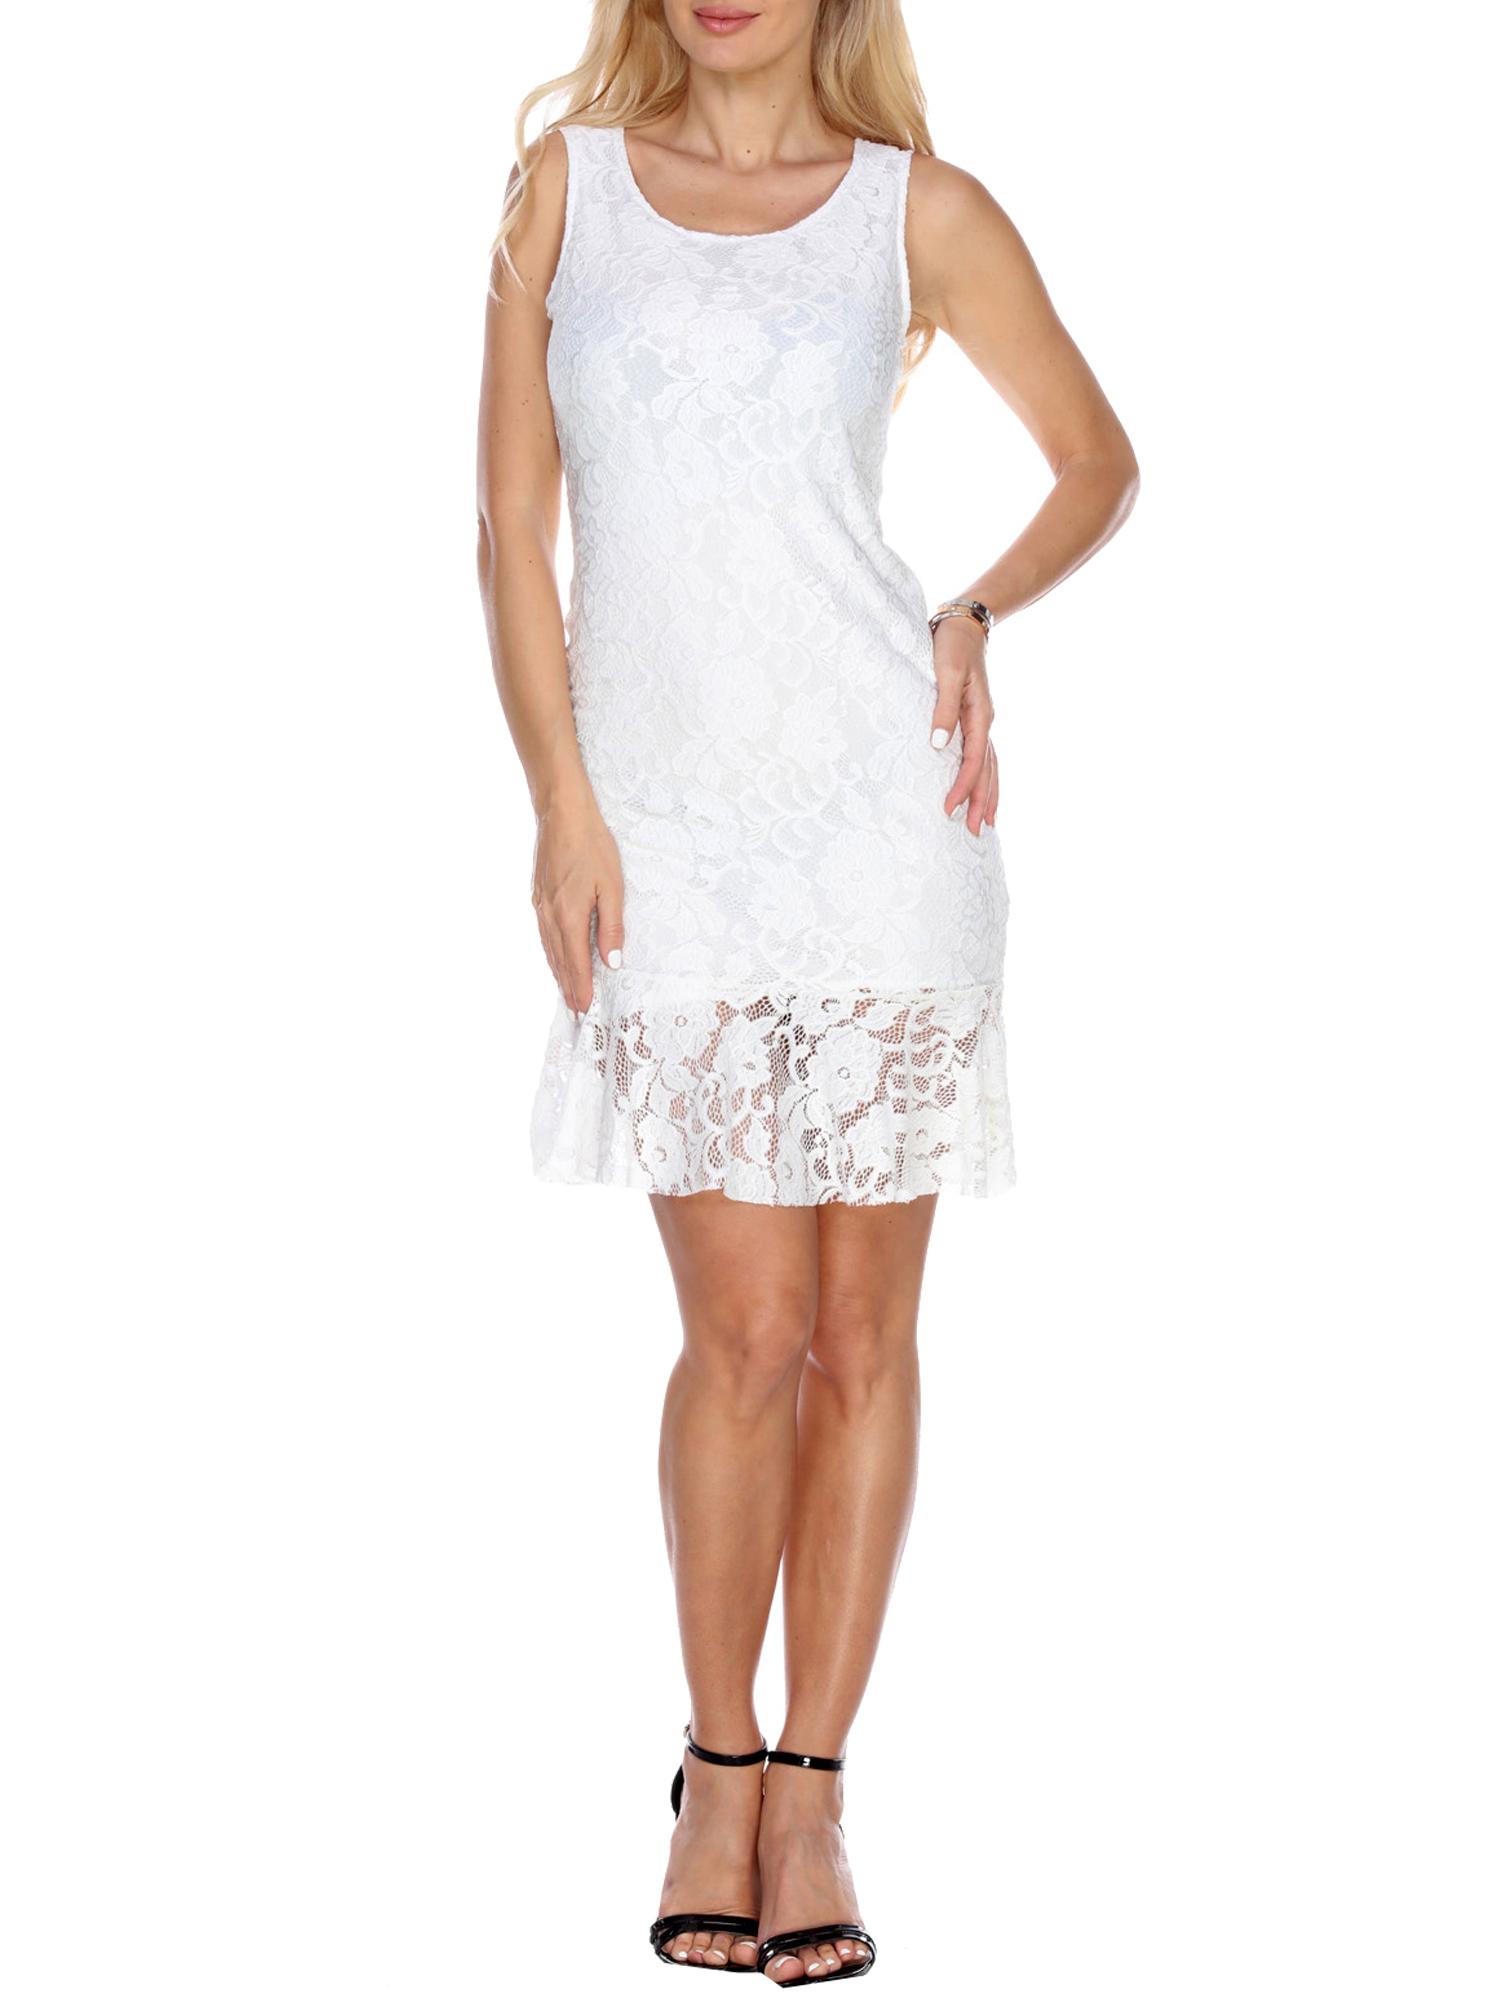 Women's Lace Mini Dress